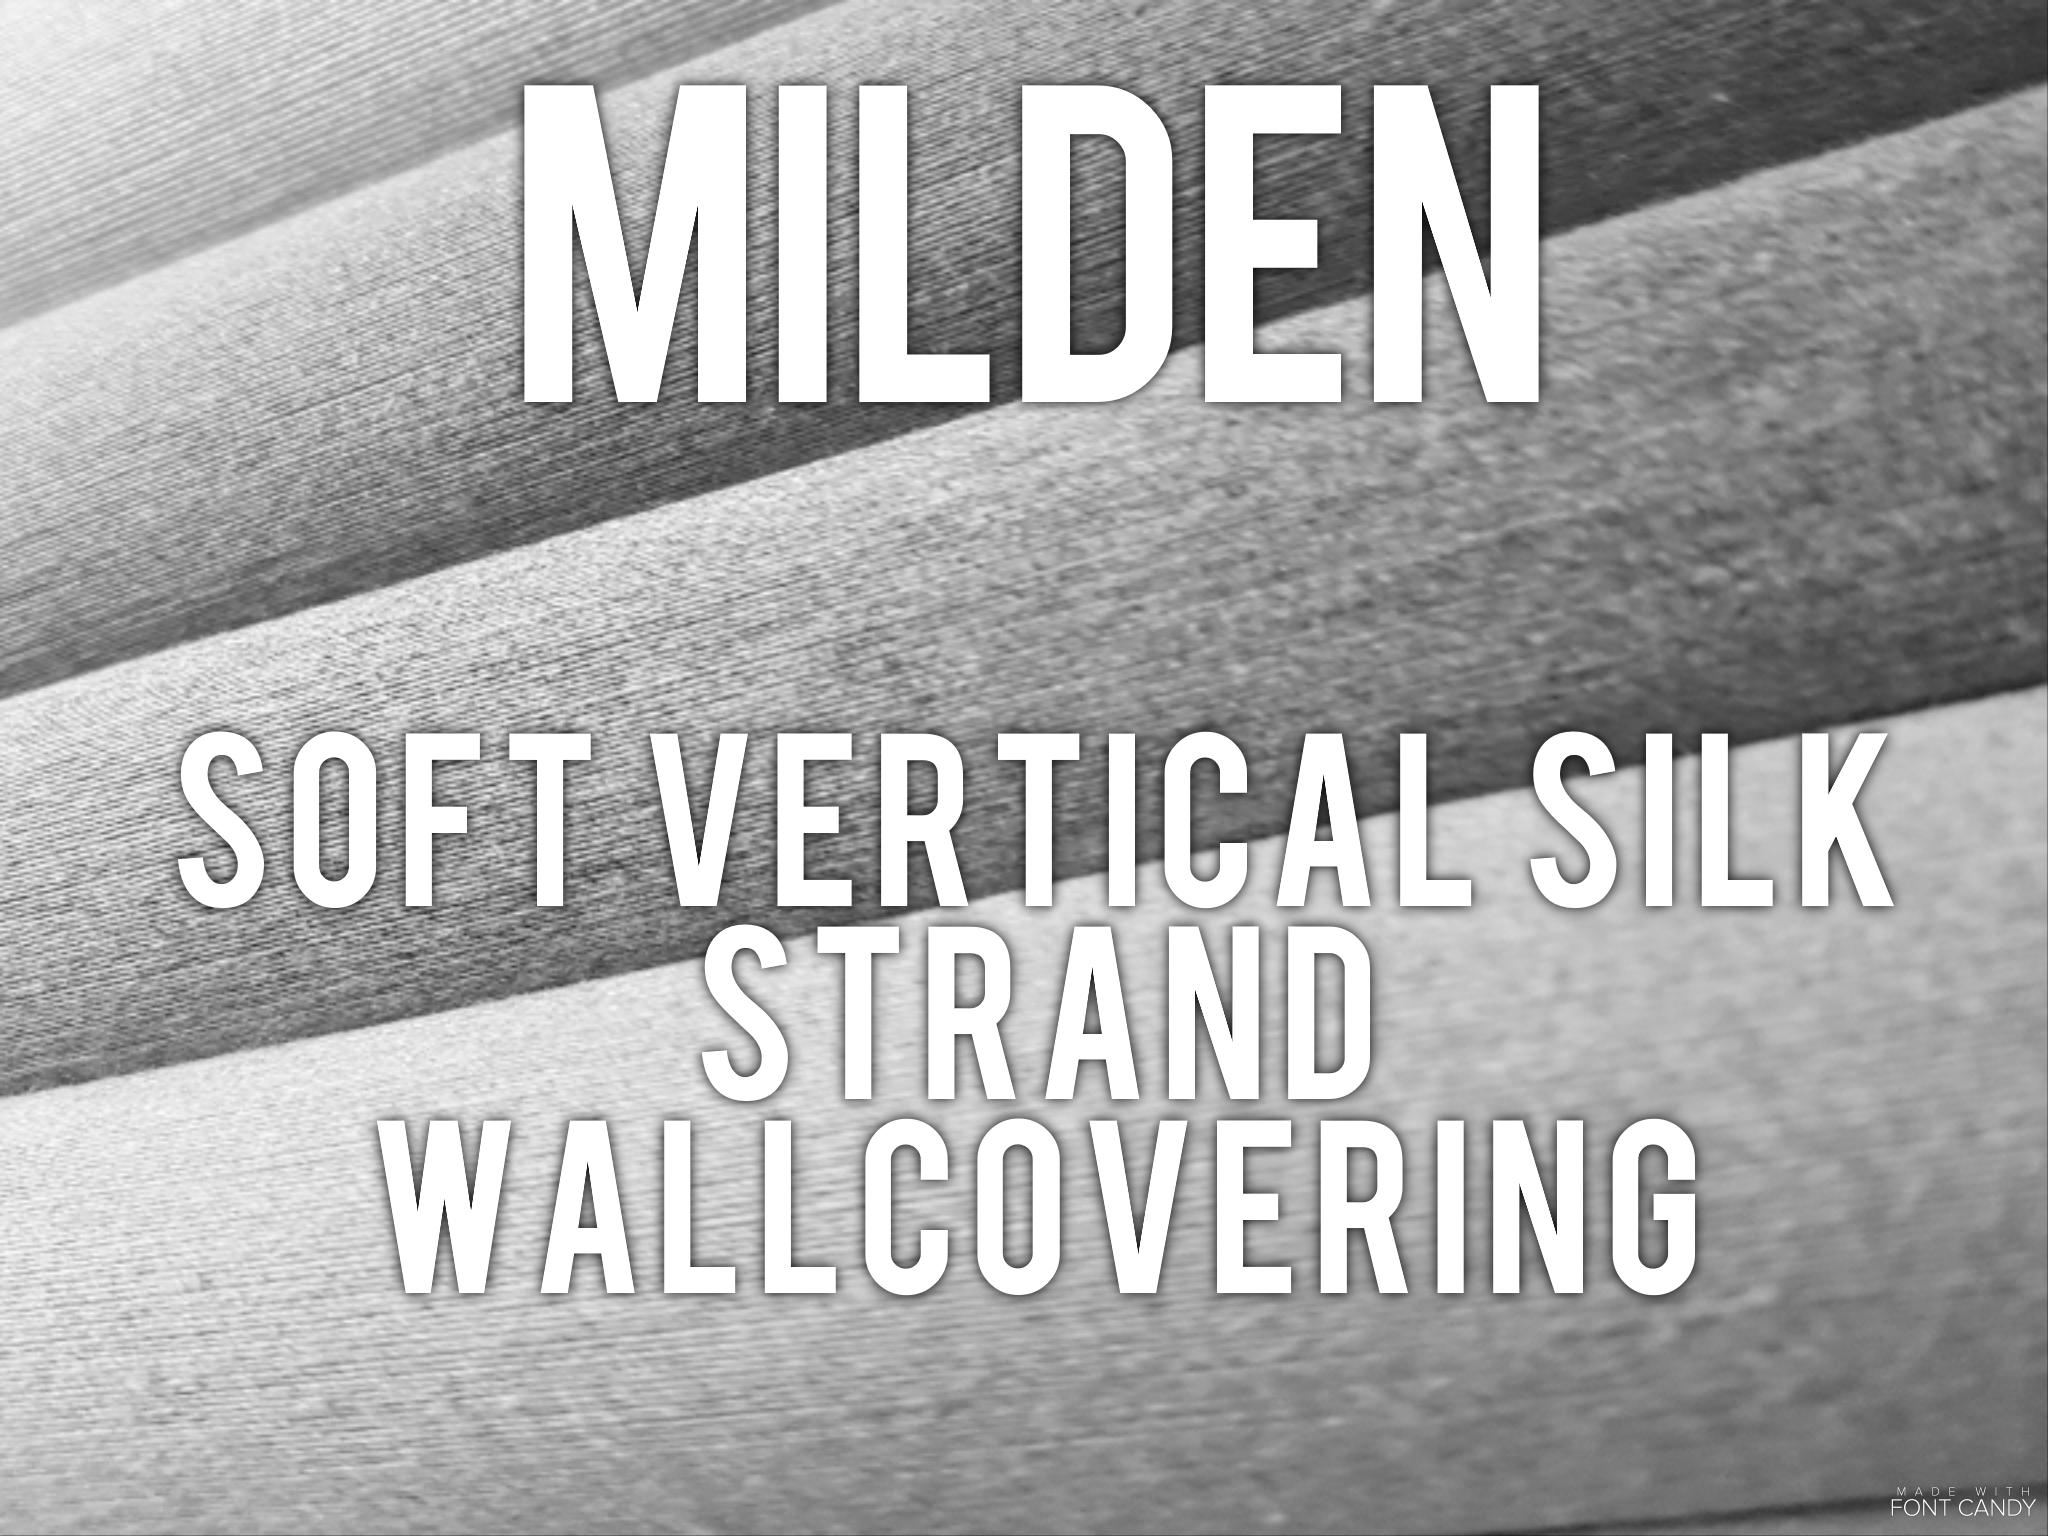 Milden - soft vertical silk strand wallcovering